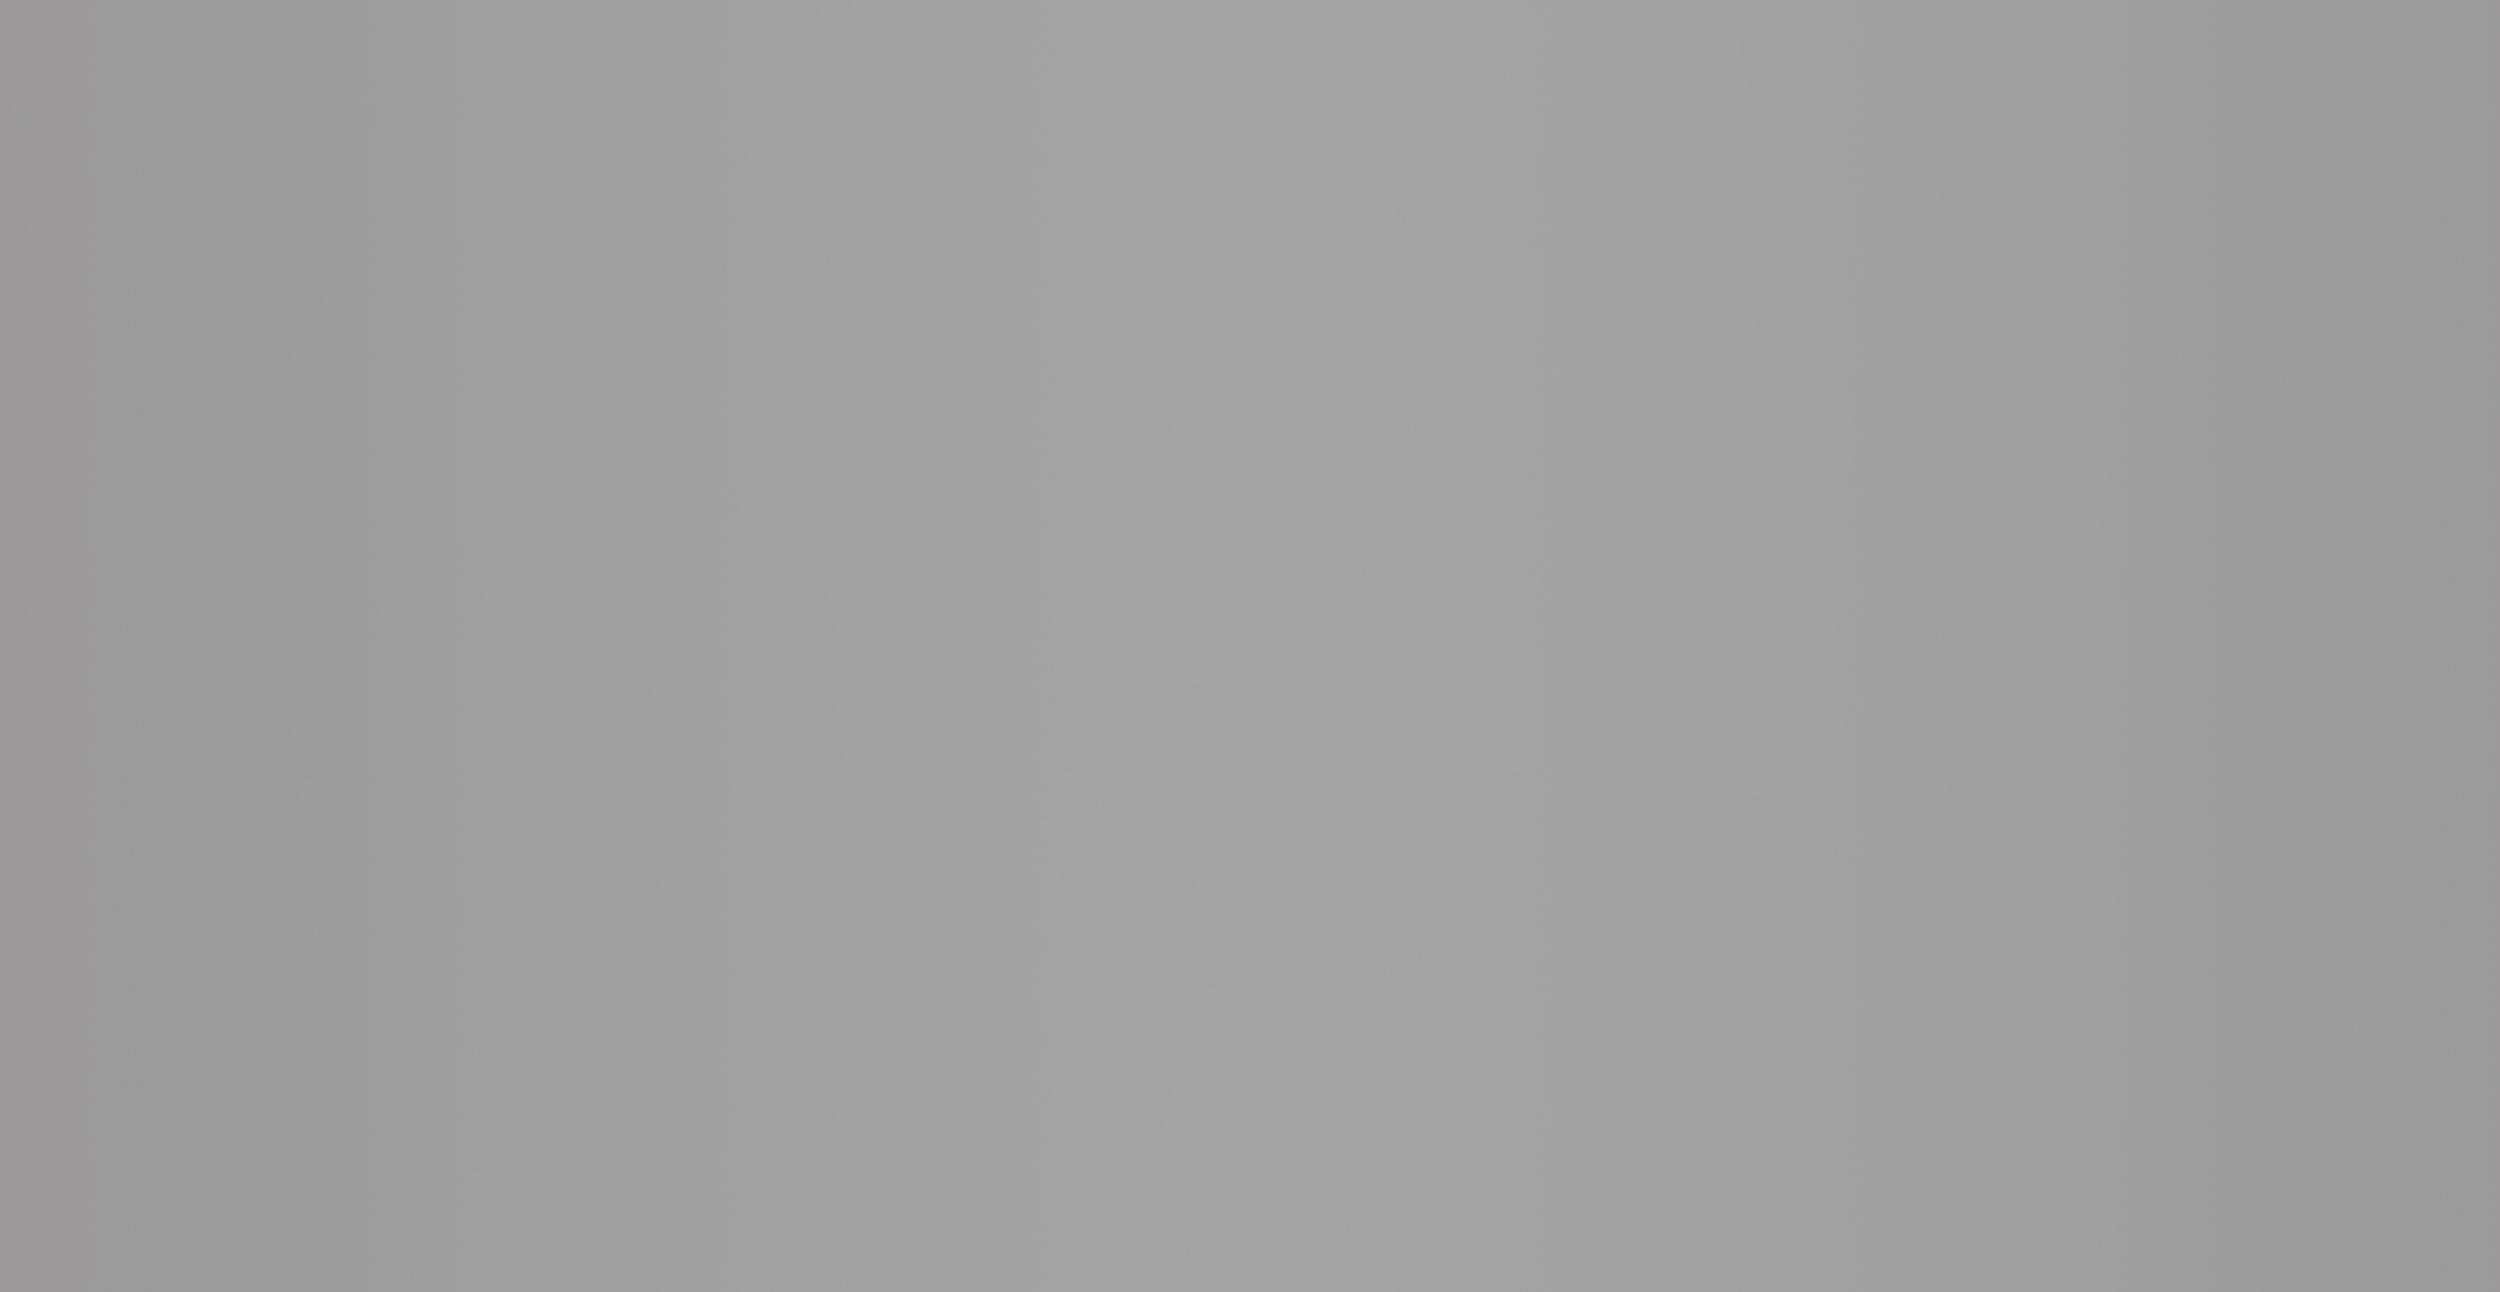 hexagon-gray3.jpg